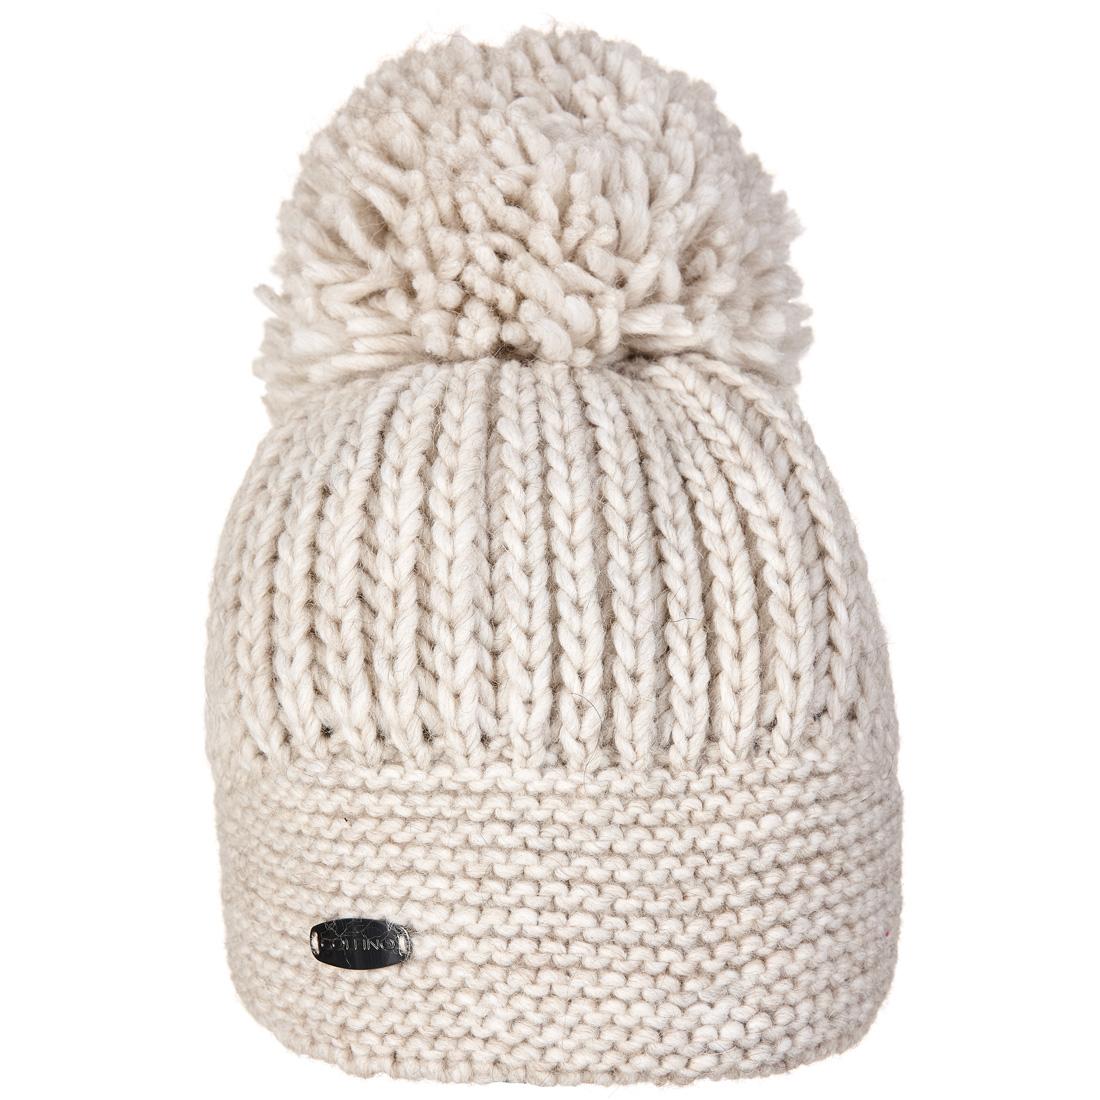 Strickmütze Cold Protection mit Pompon aus feimem Alpaka-Mix